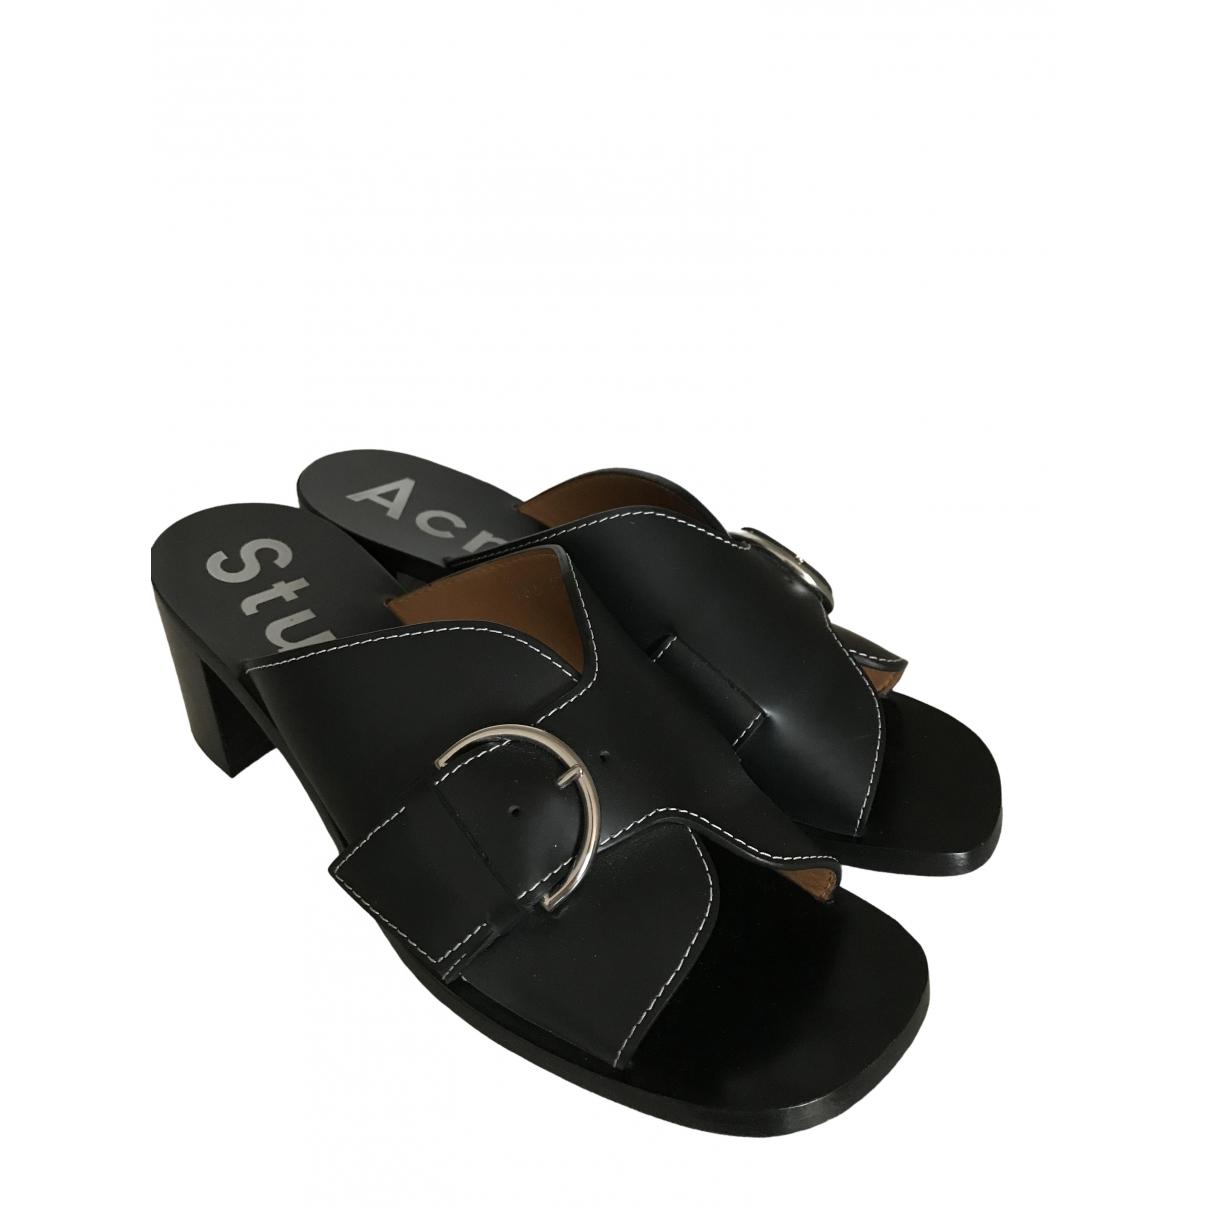 Acne Studios \N Black Leather Sandals for Women 40 EU